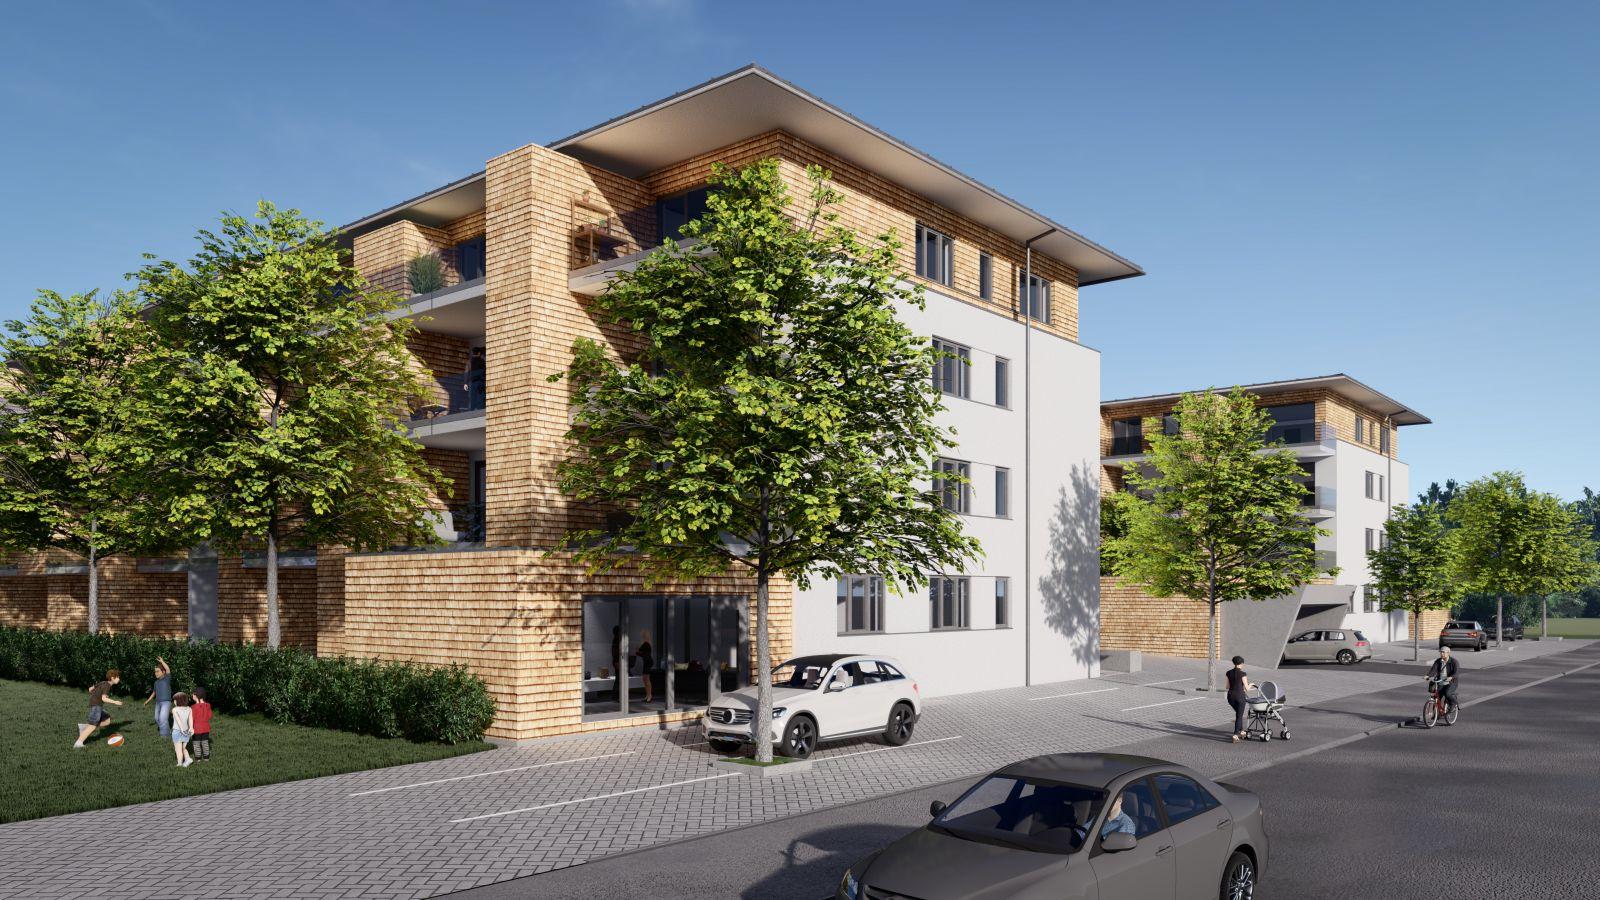 Mehrfamilienhaus-Simbach-am-Inn-02